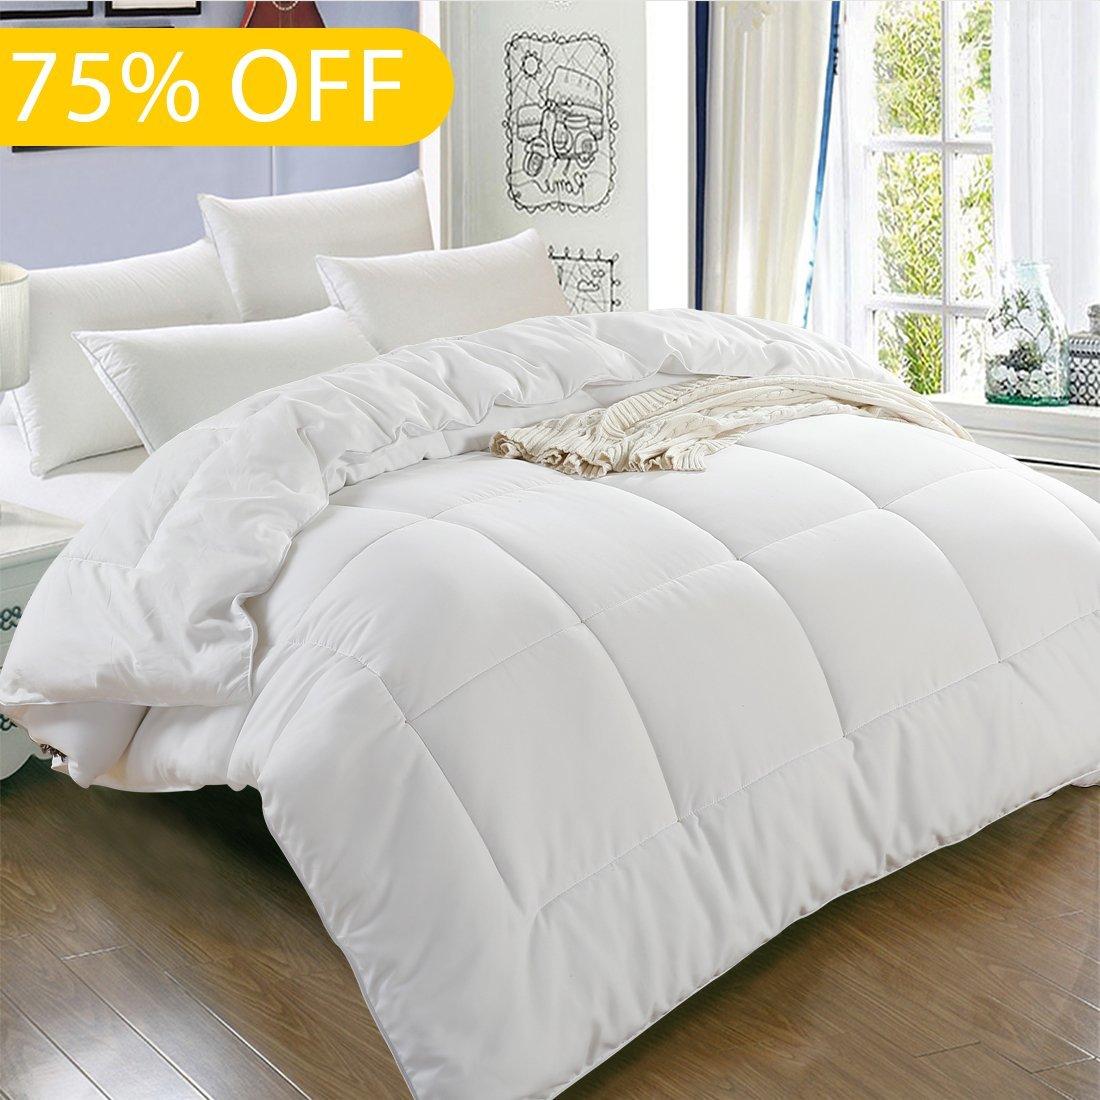 Down Alternative Comforter Hypoallergenic